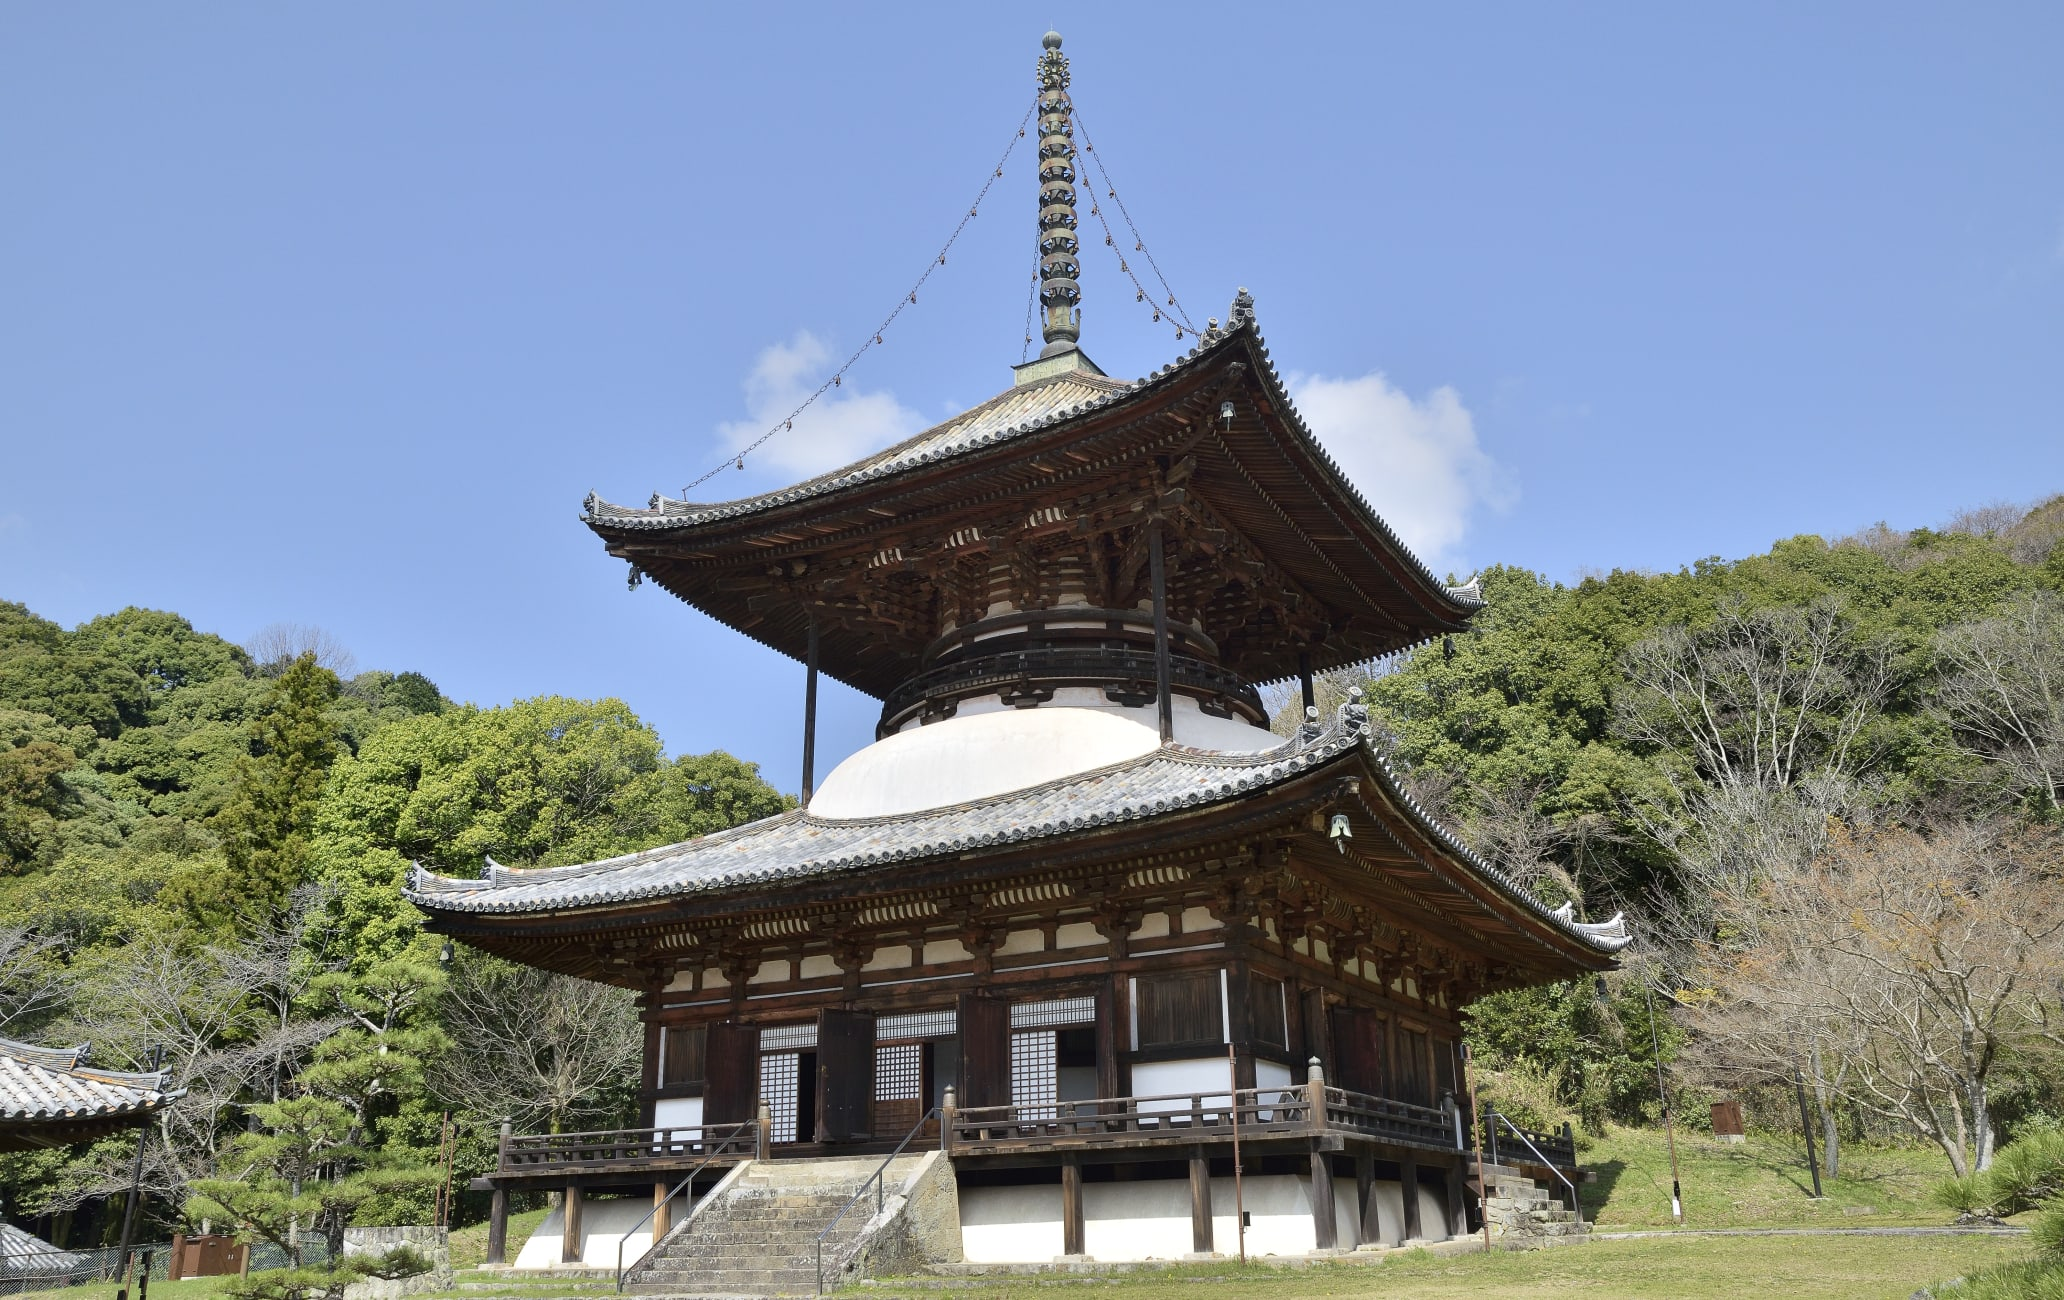 Neogoroji Temple